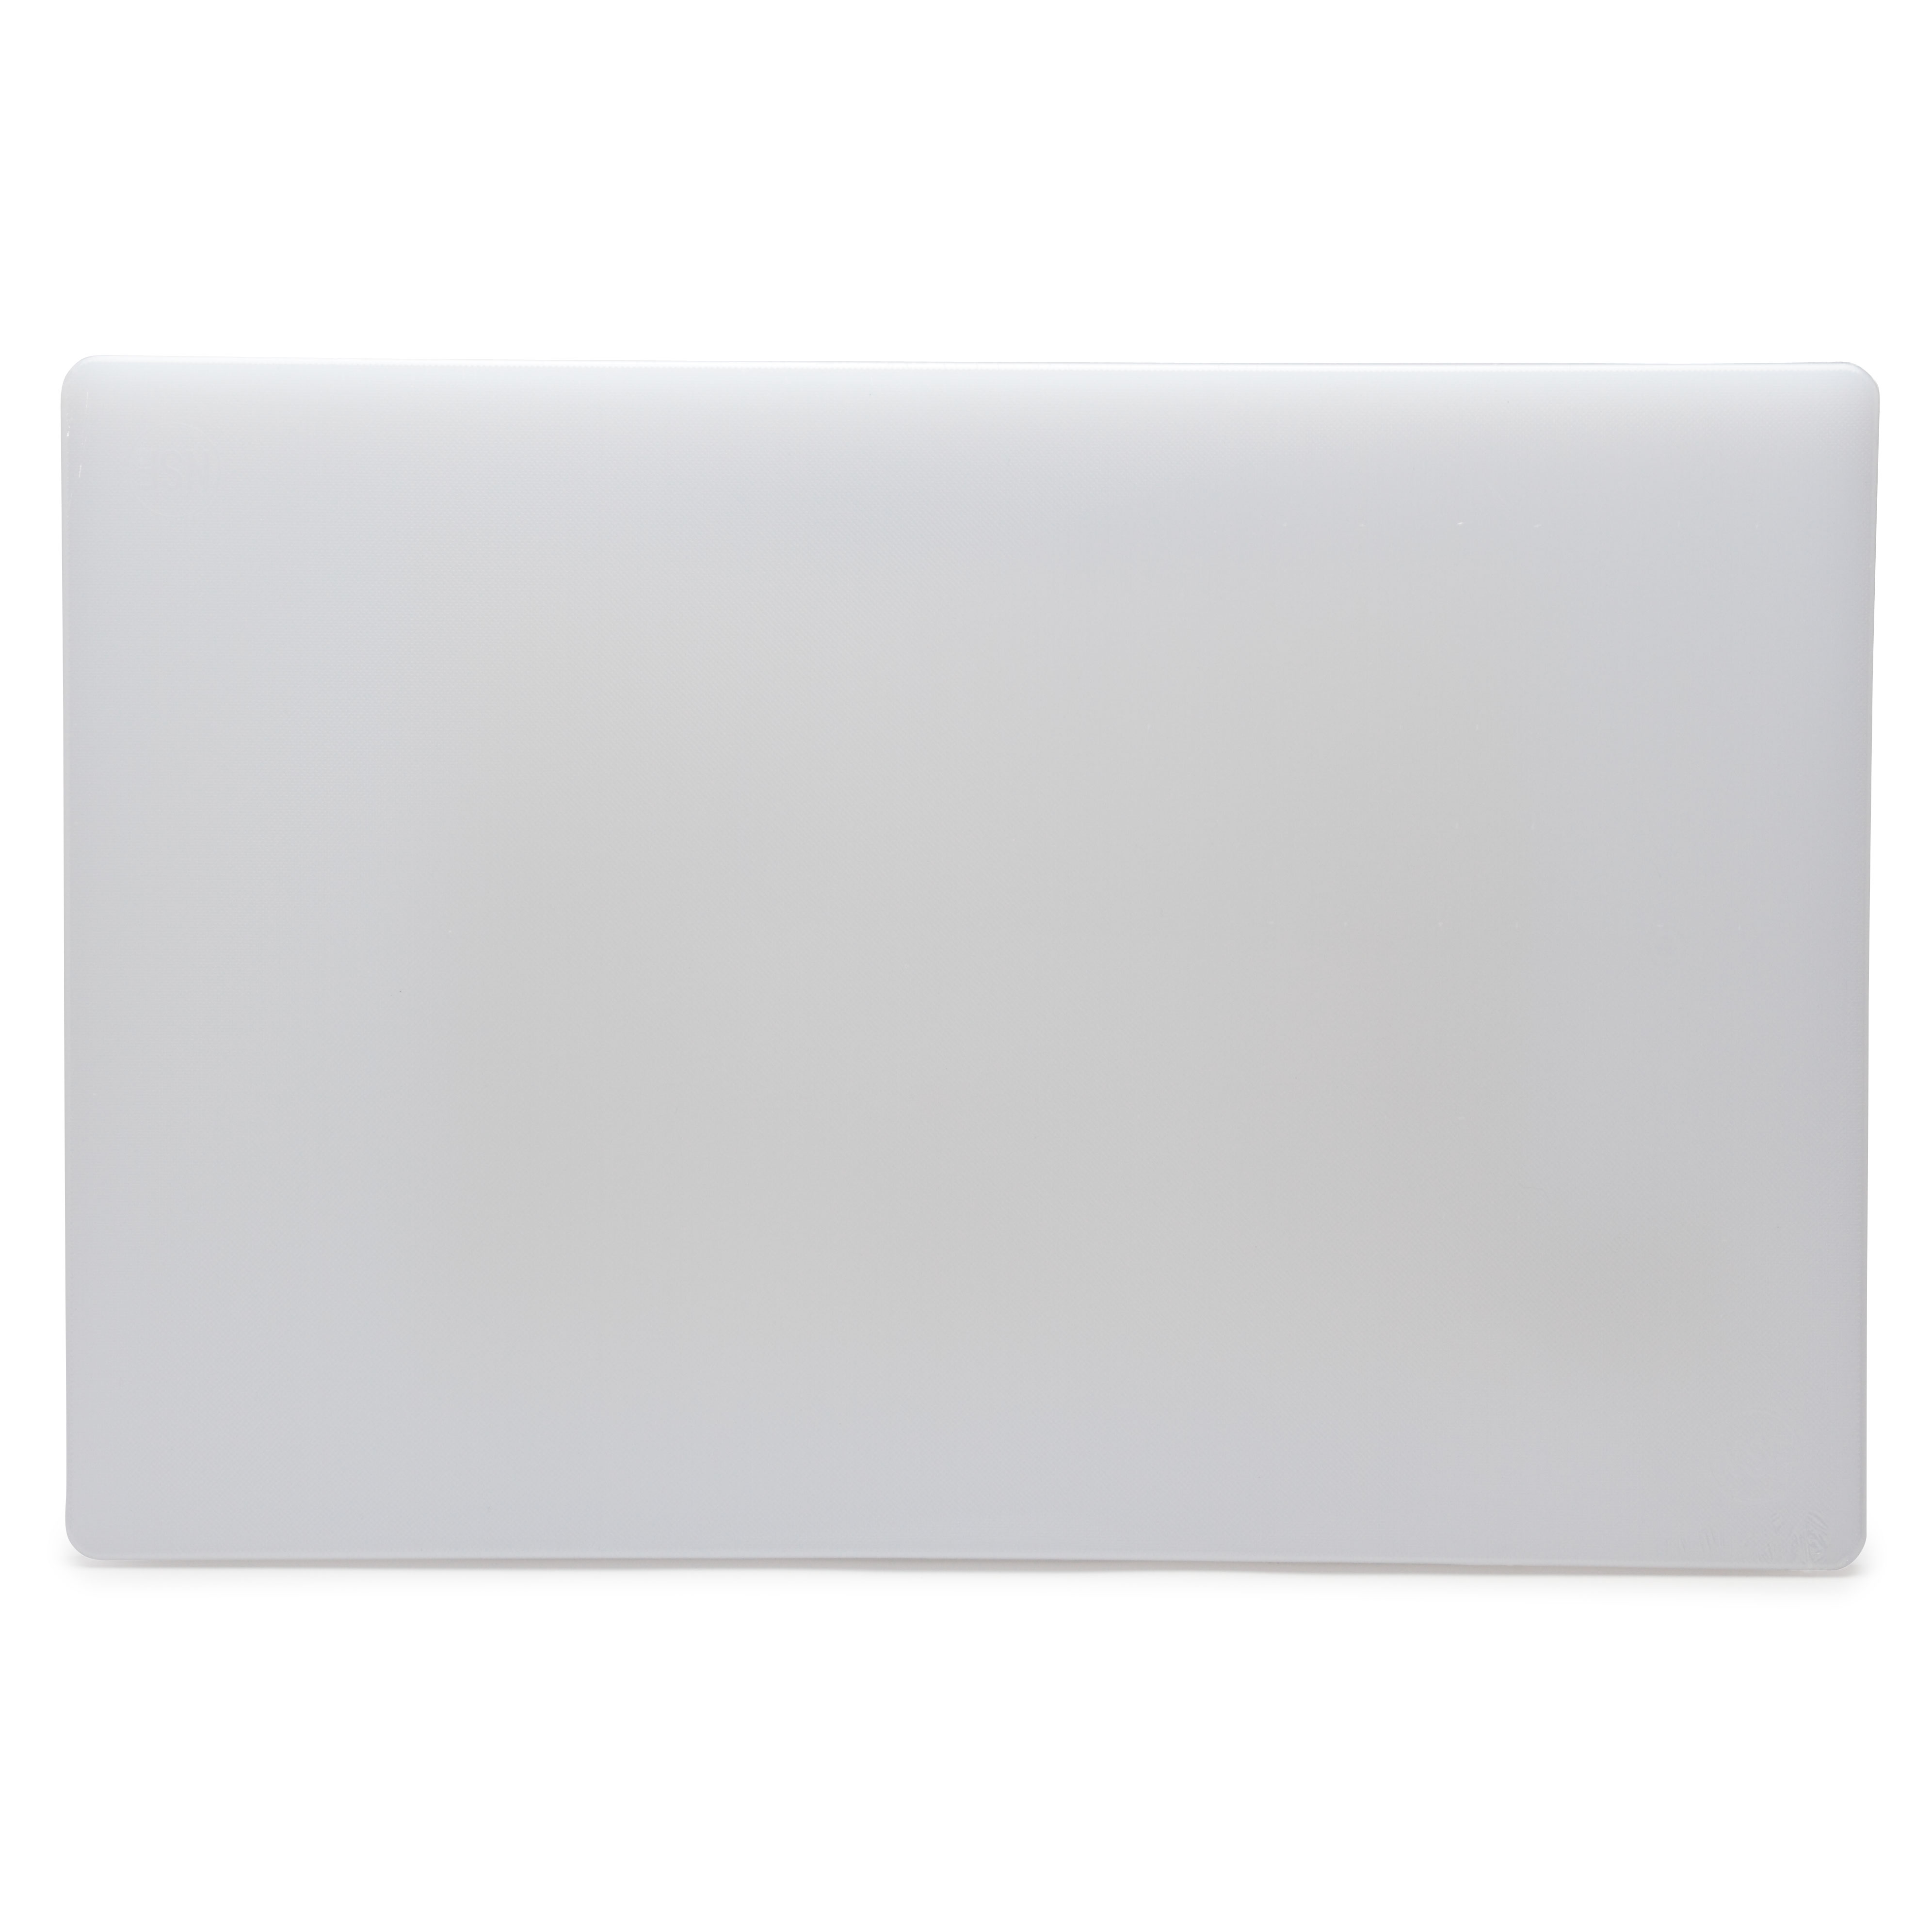 Royal Industries ROY CB 1218 WHT cutting board, plastic